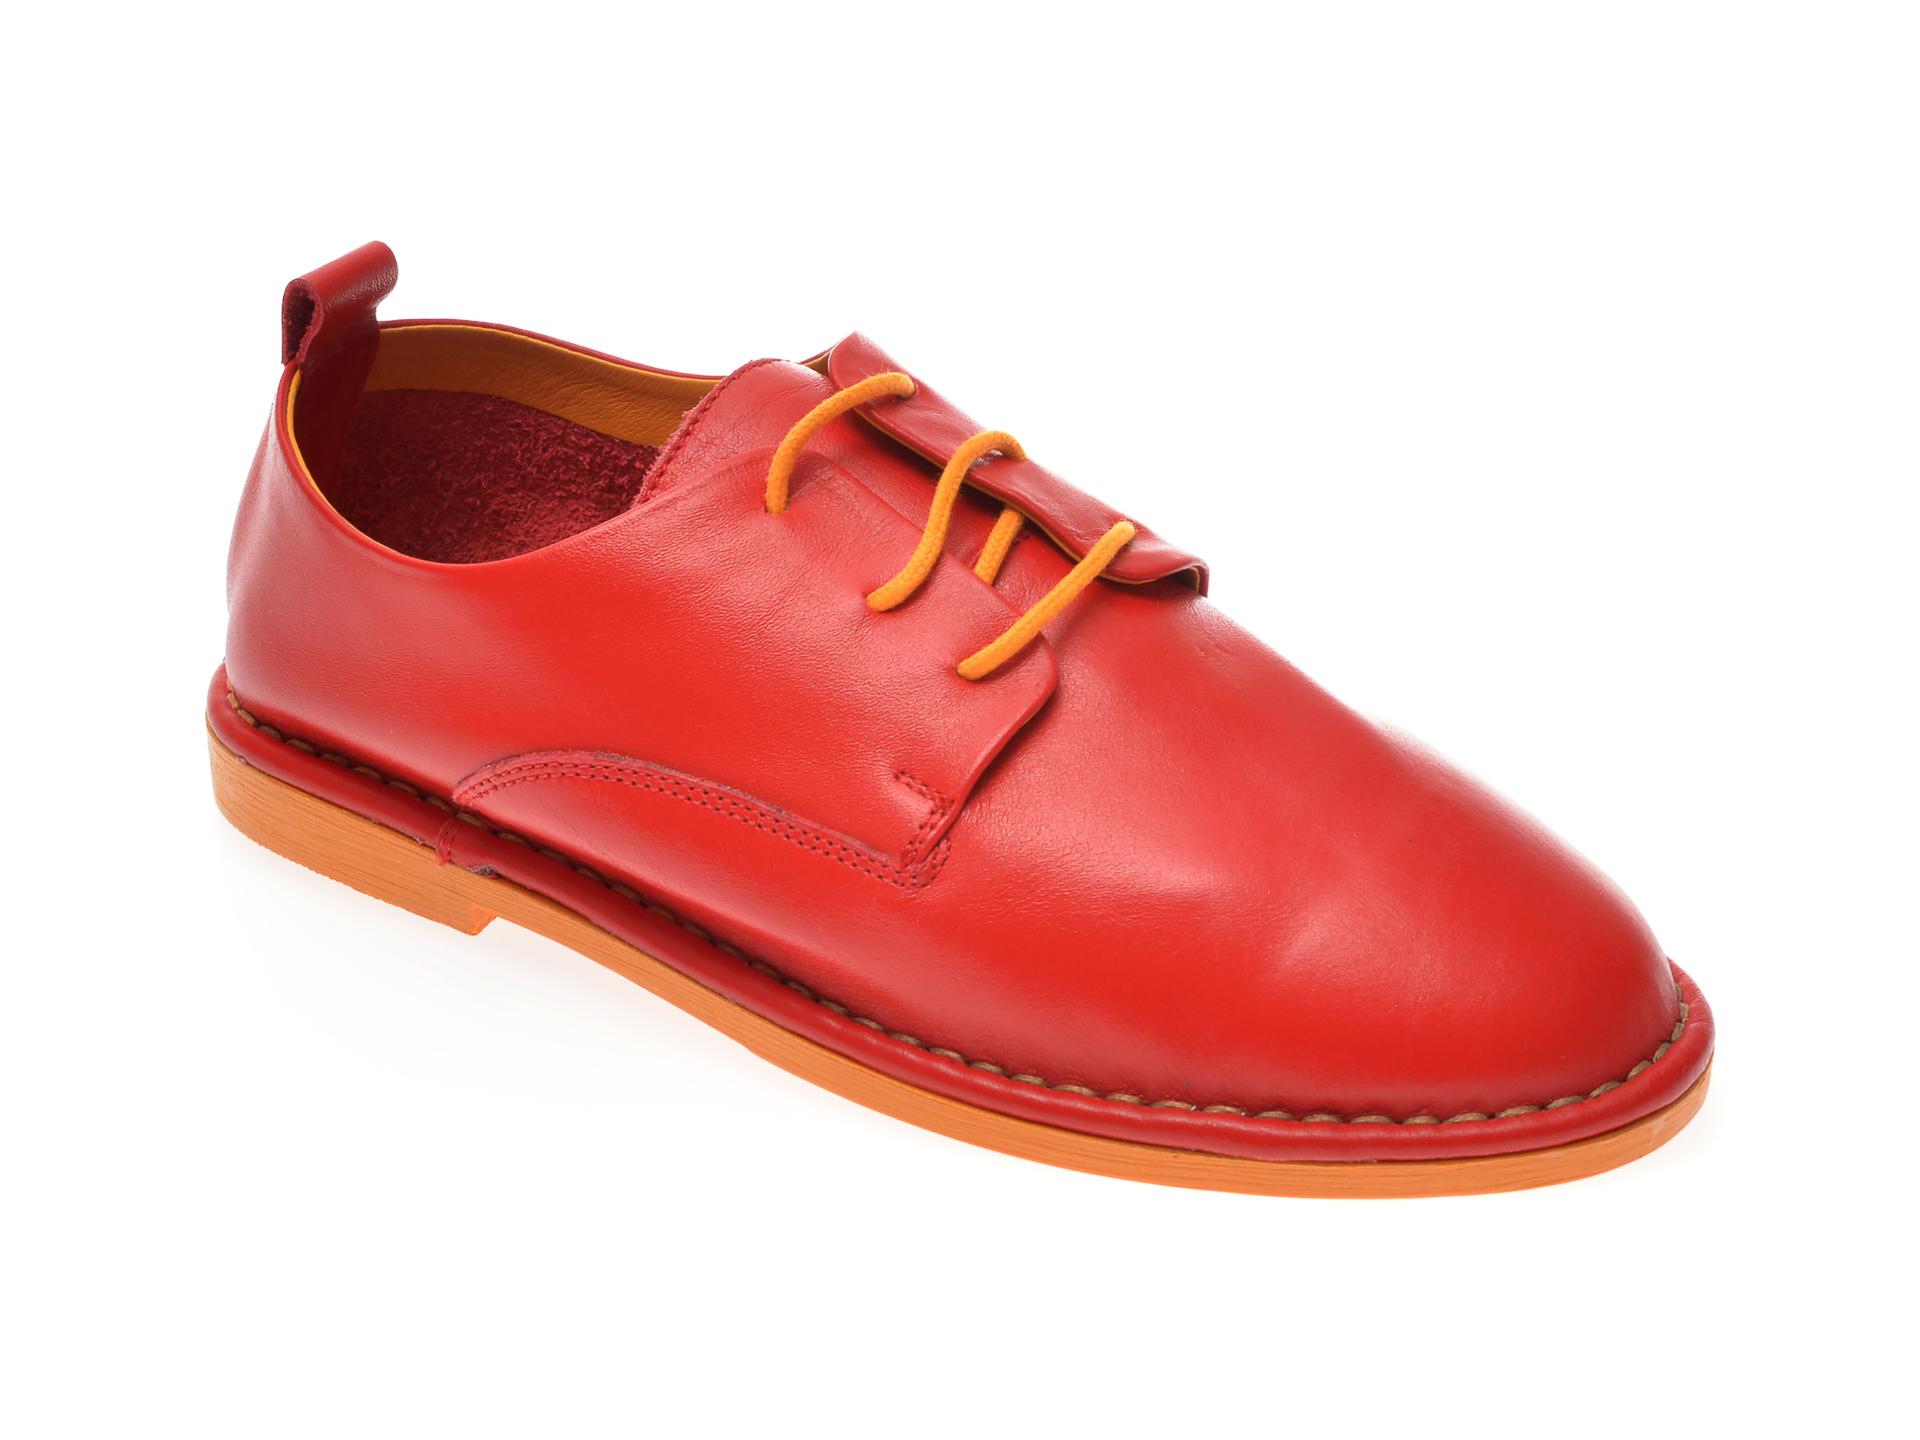 Pantofi LE BERDE rosii, 14, din piele naturala New